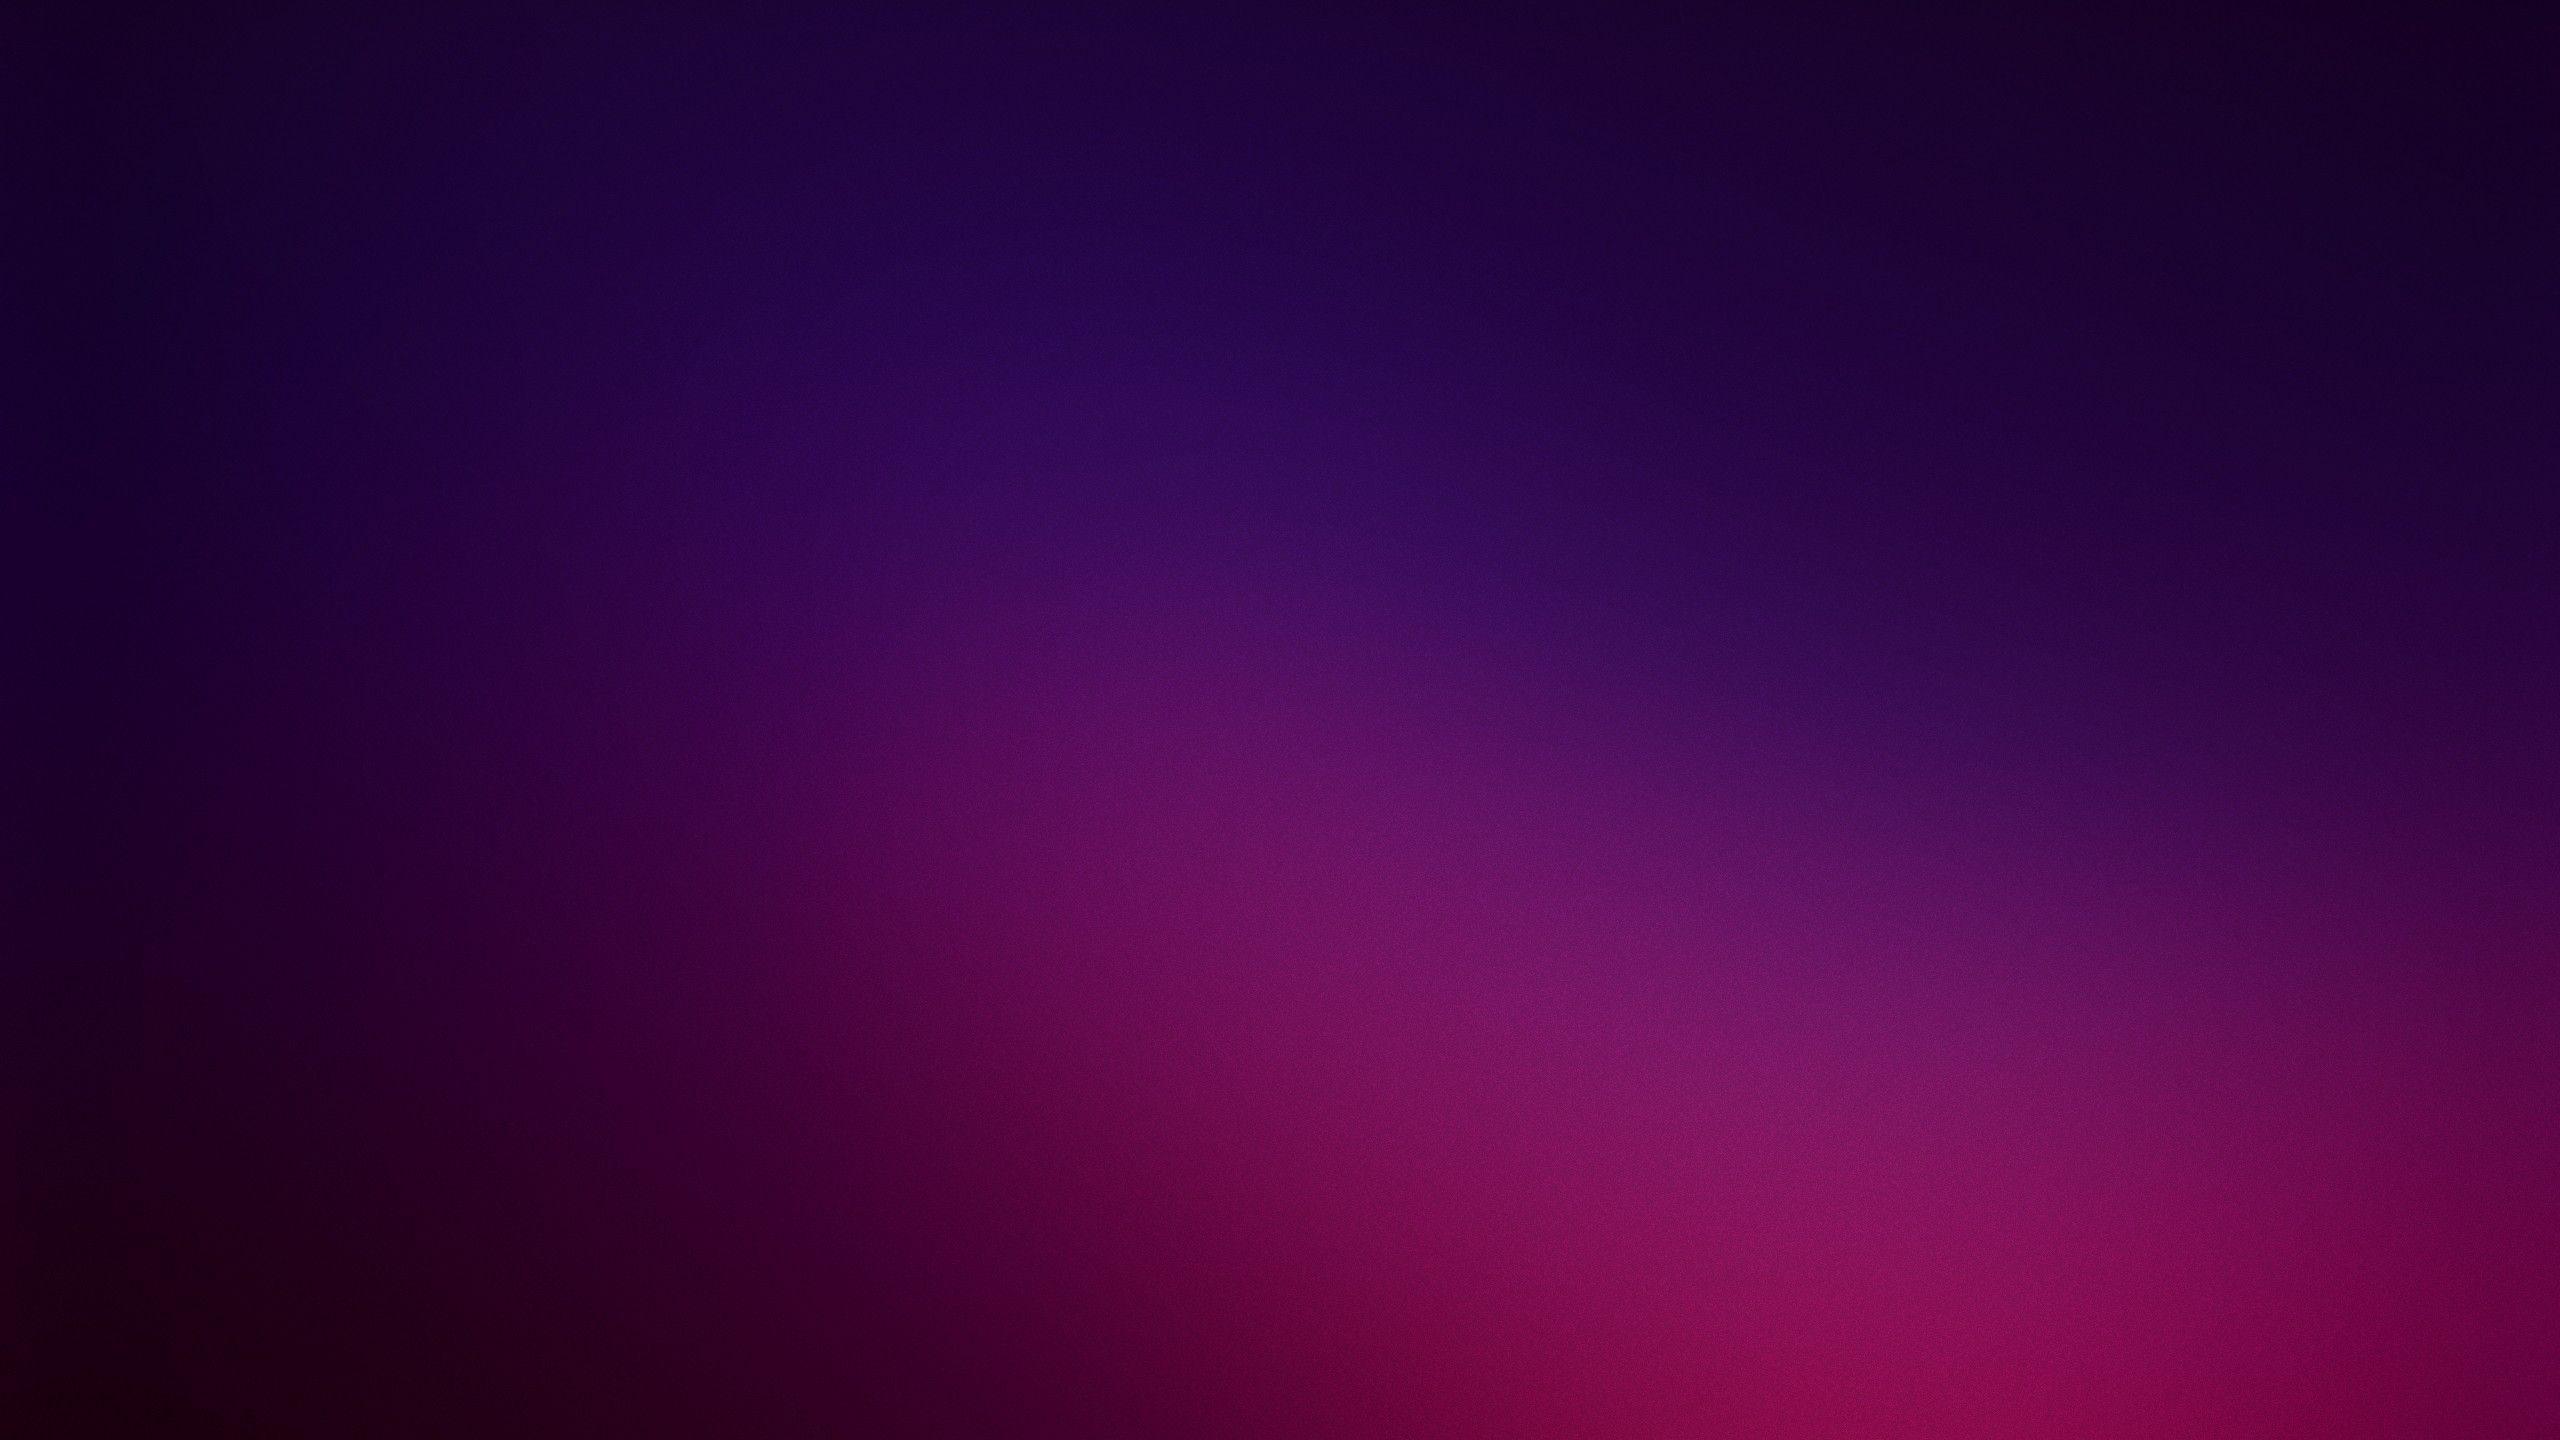 Download 76 Background Hd Wallpapers 1080P HD Paling Keren